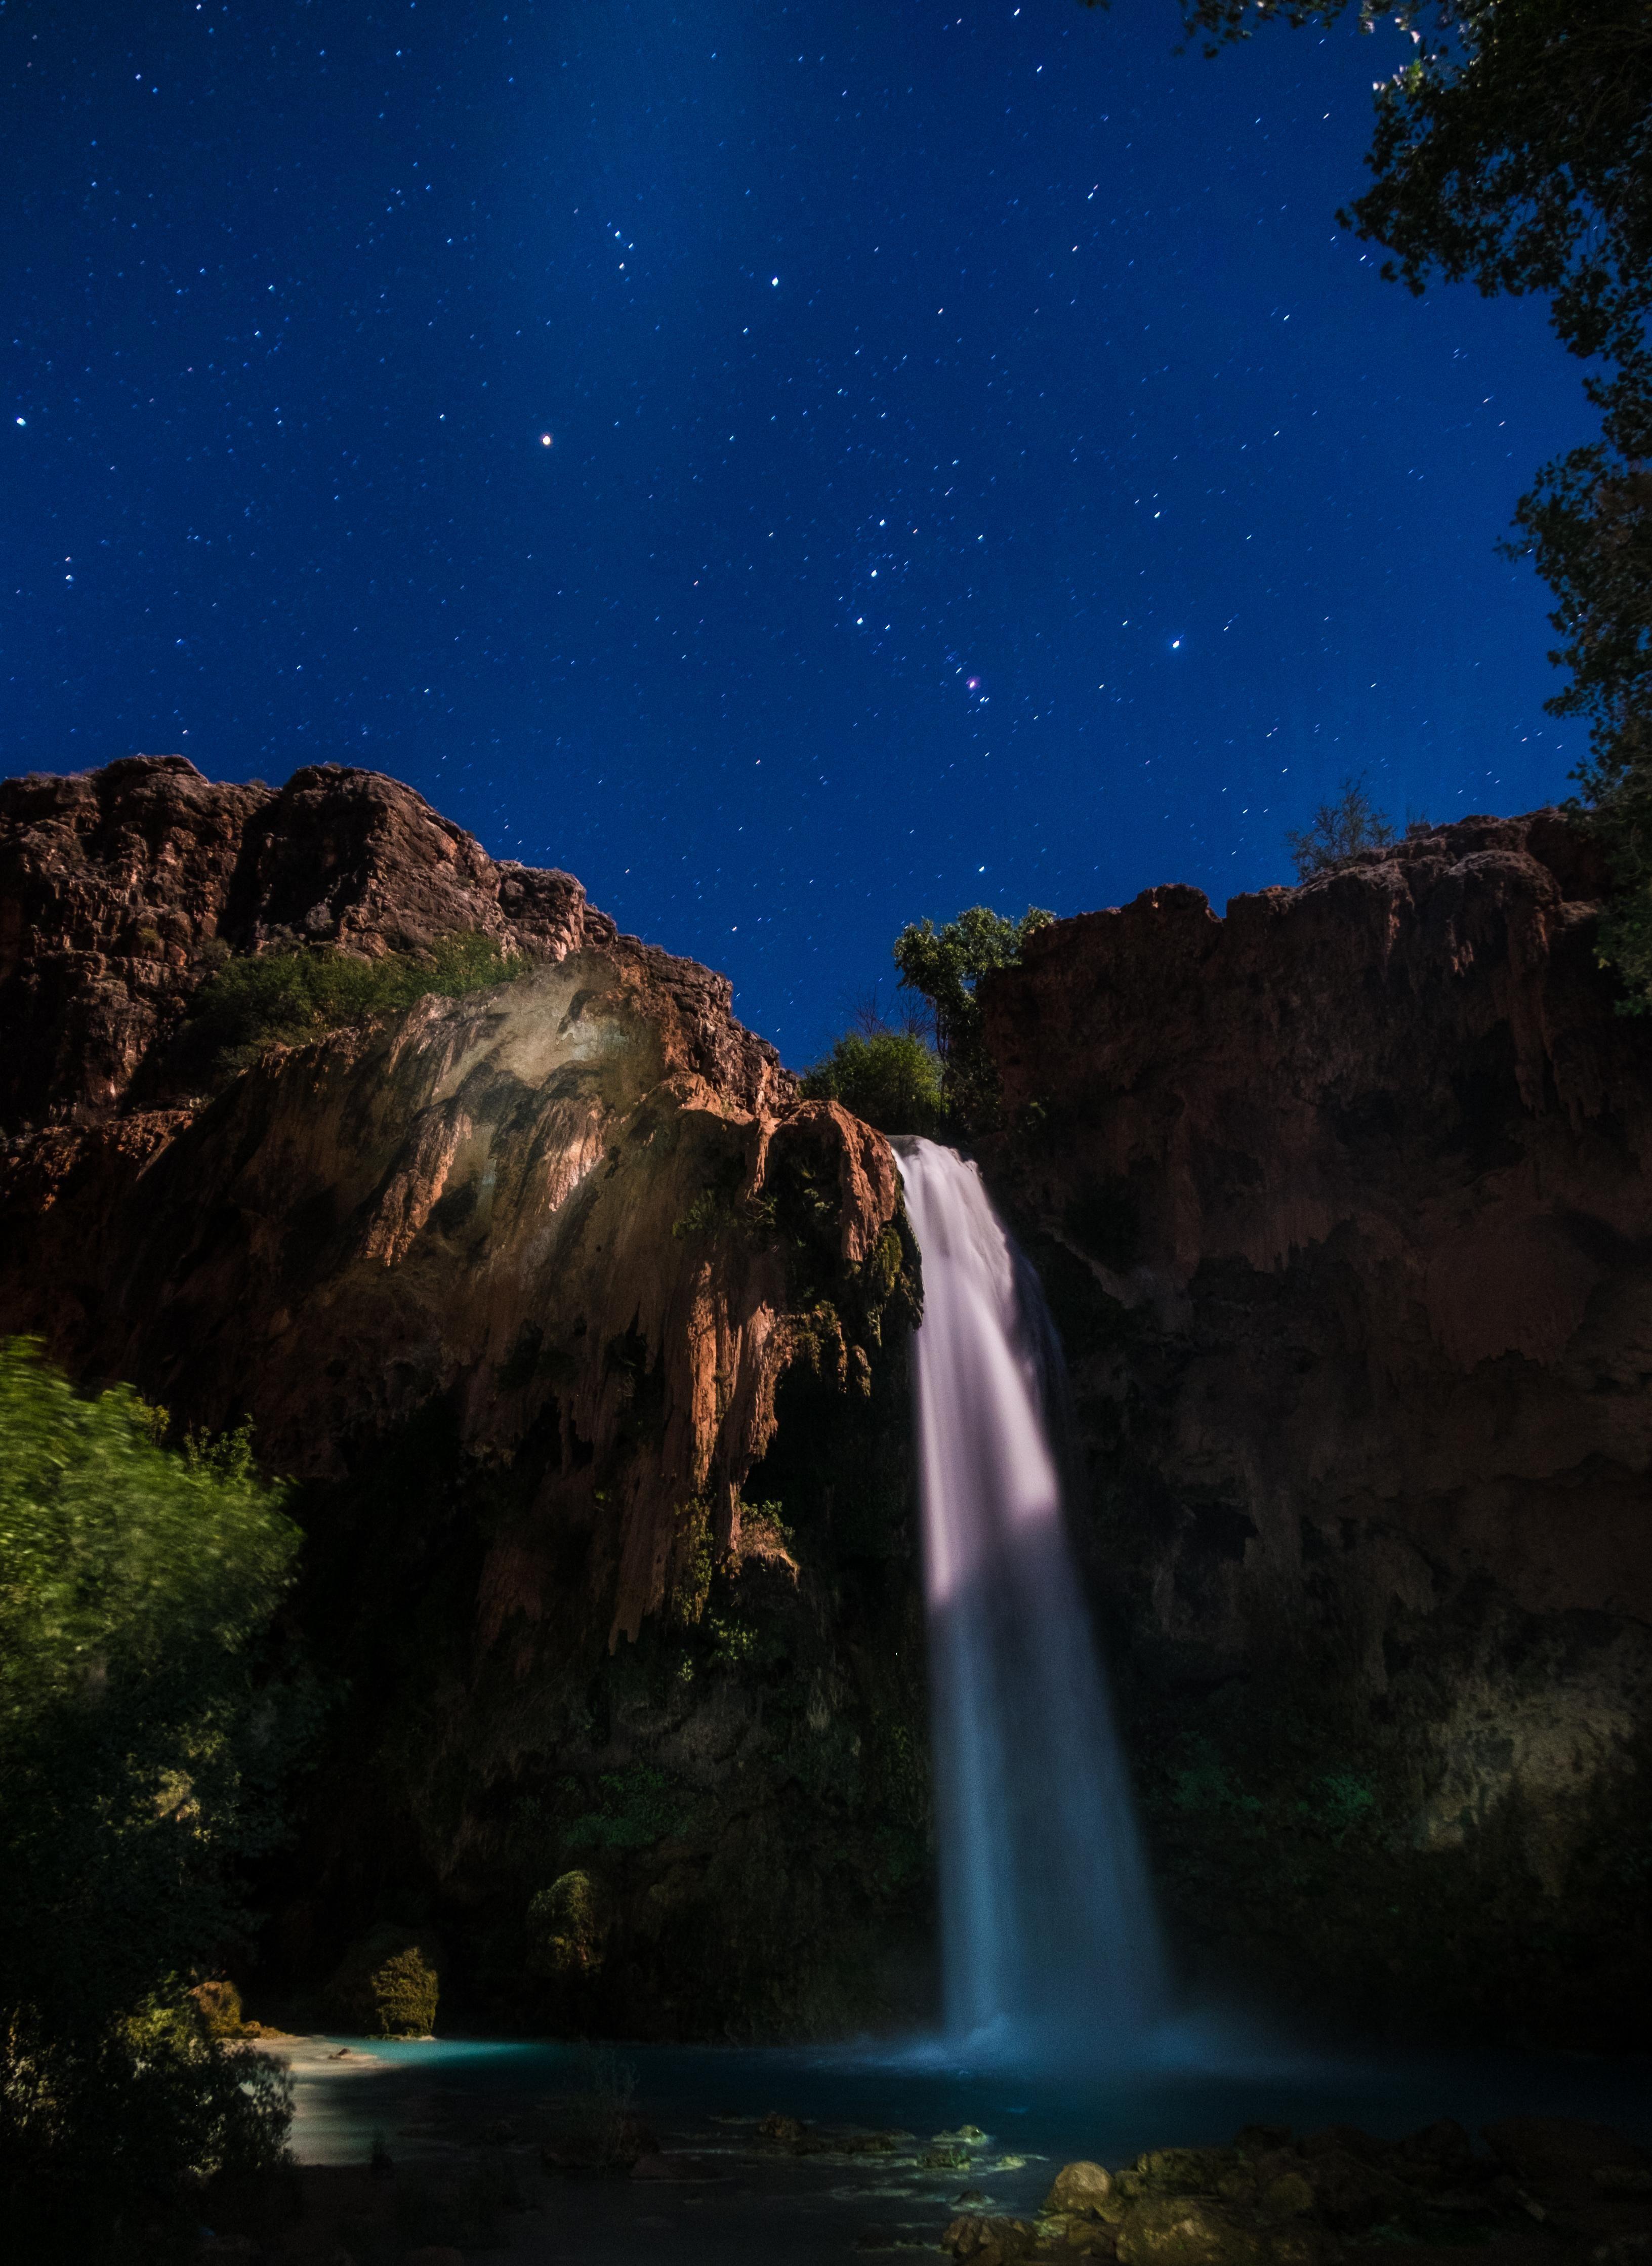 Day shifts to night in the Arizona sky   Sky photos